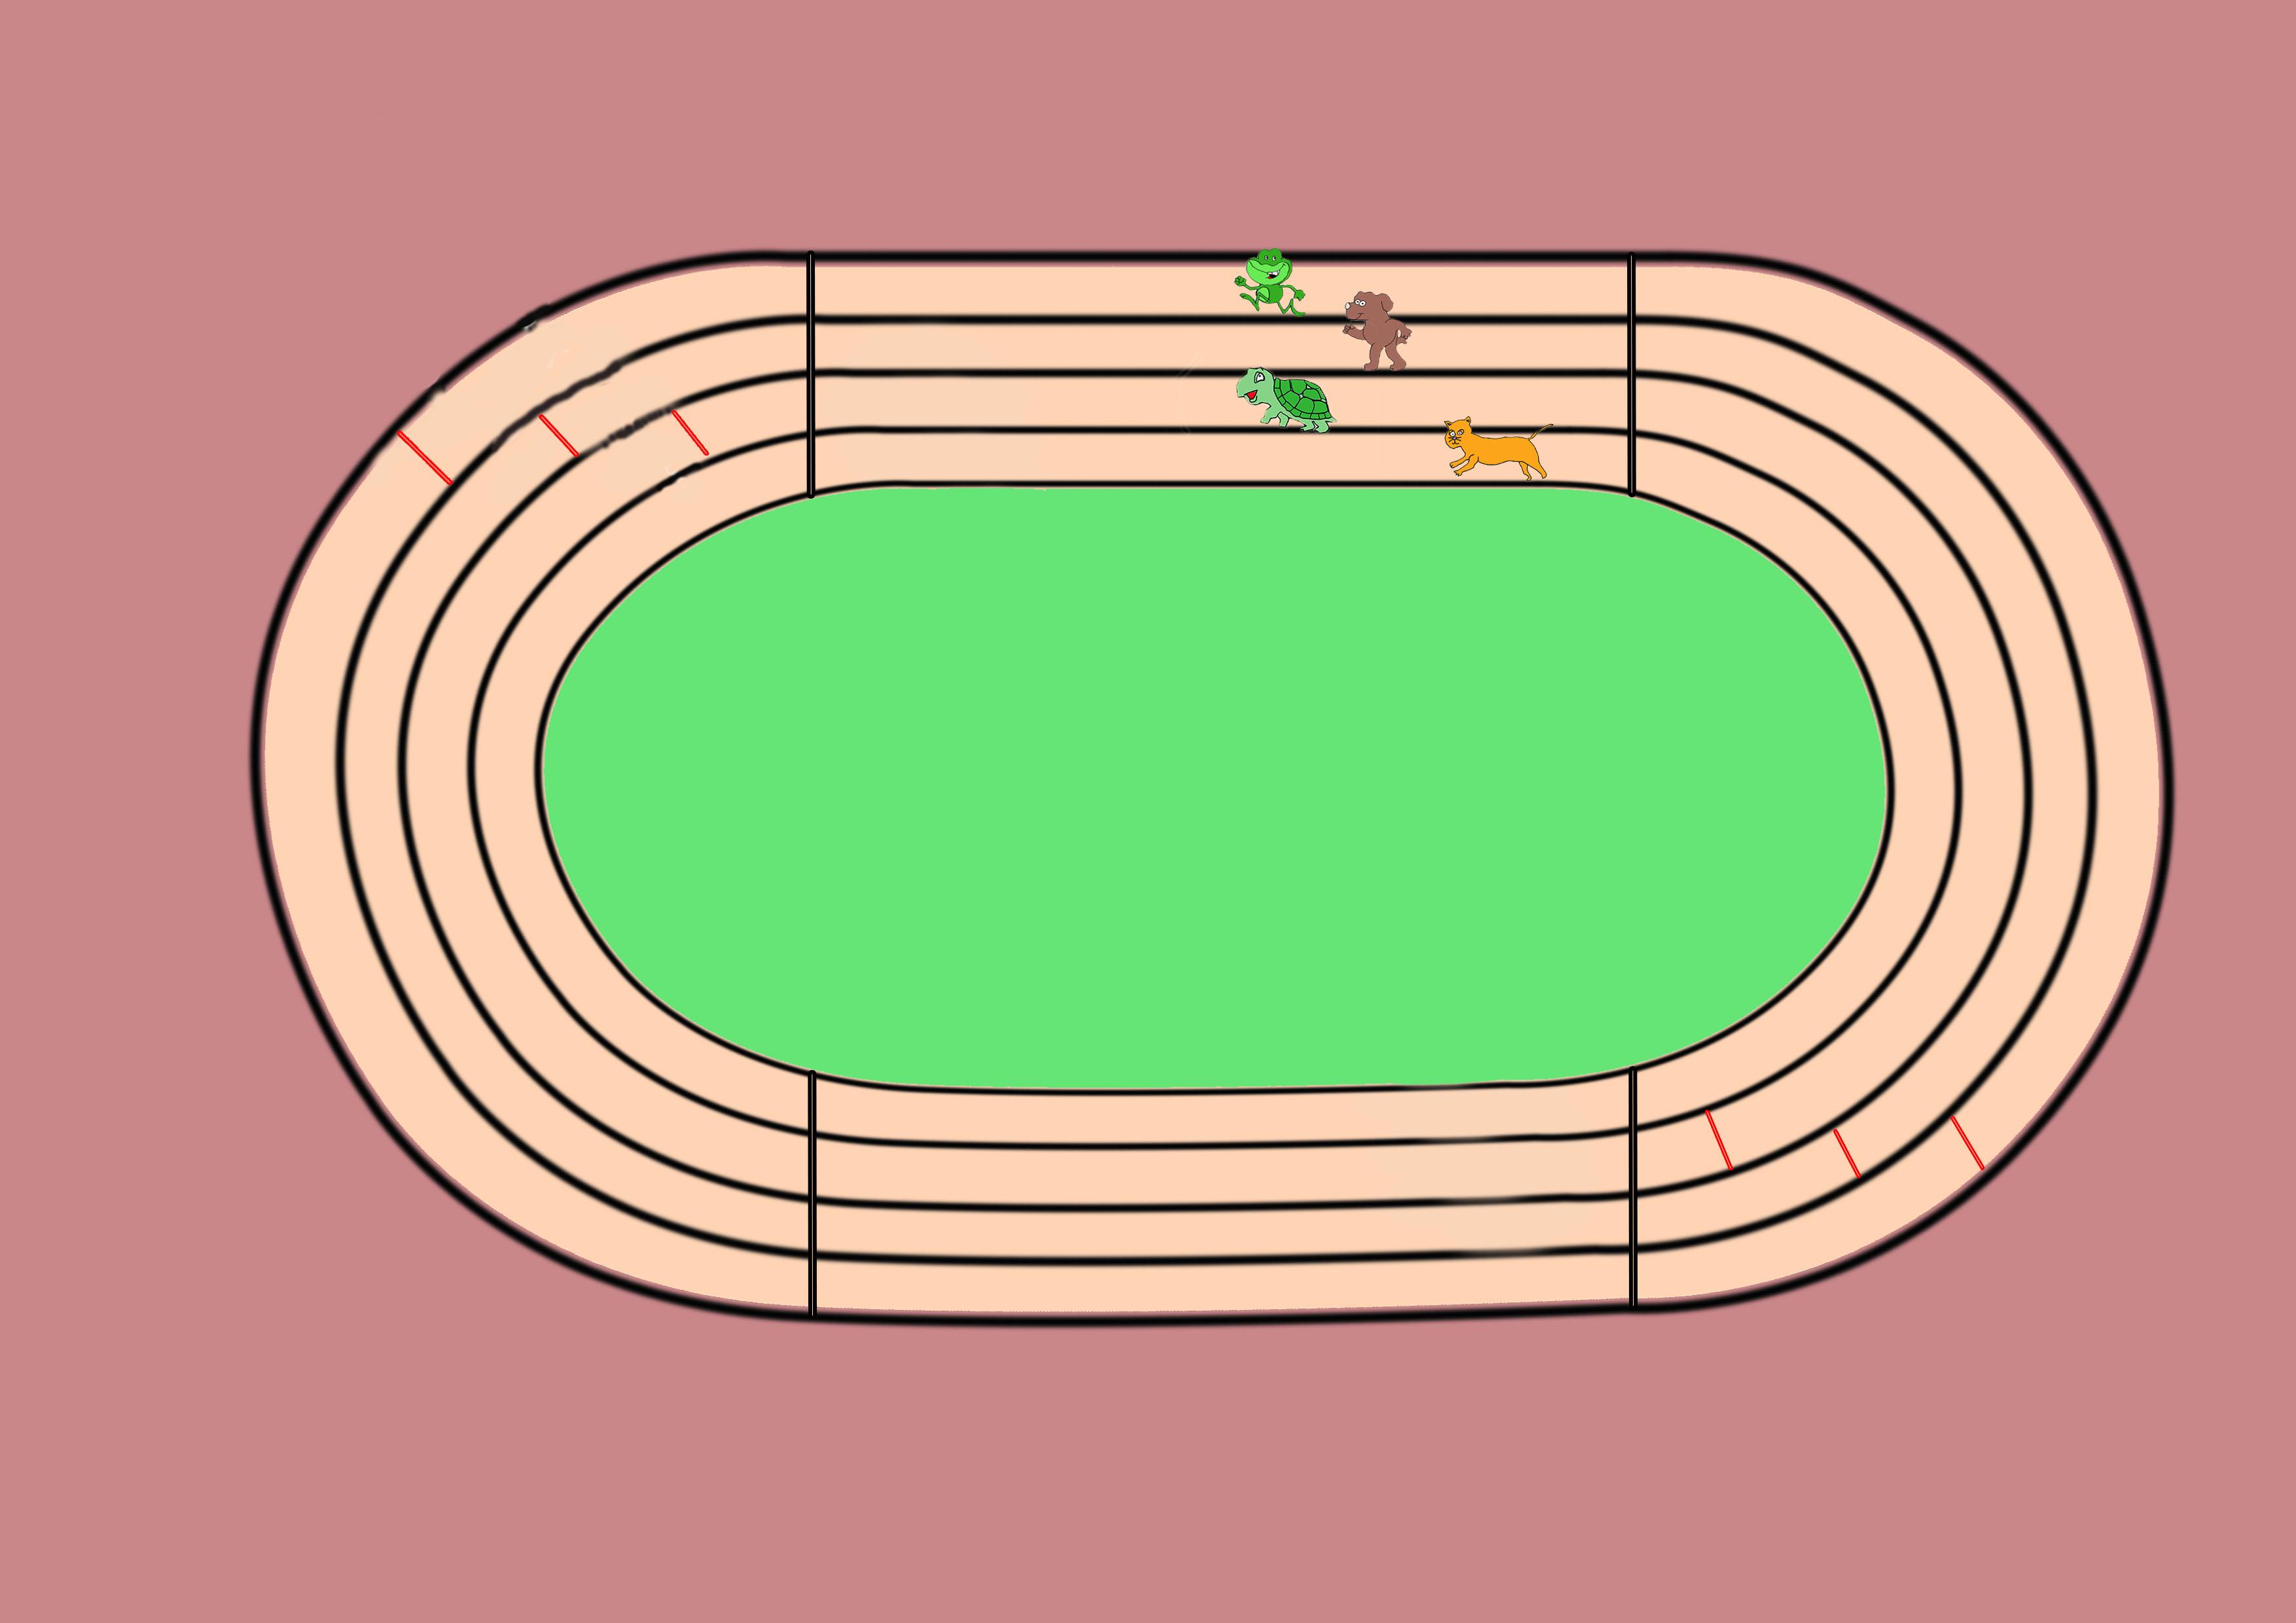 3508x2480 400m Race Track (Environment) Iqbal Ali